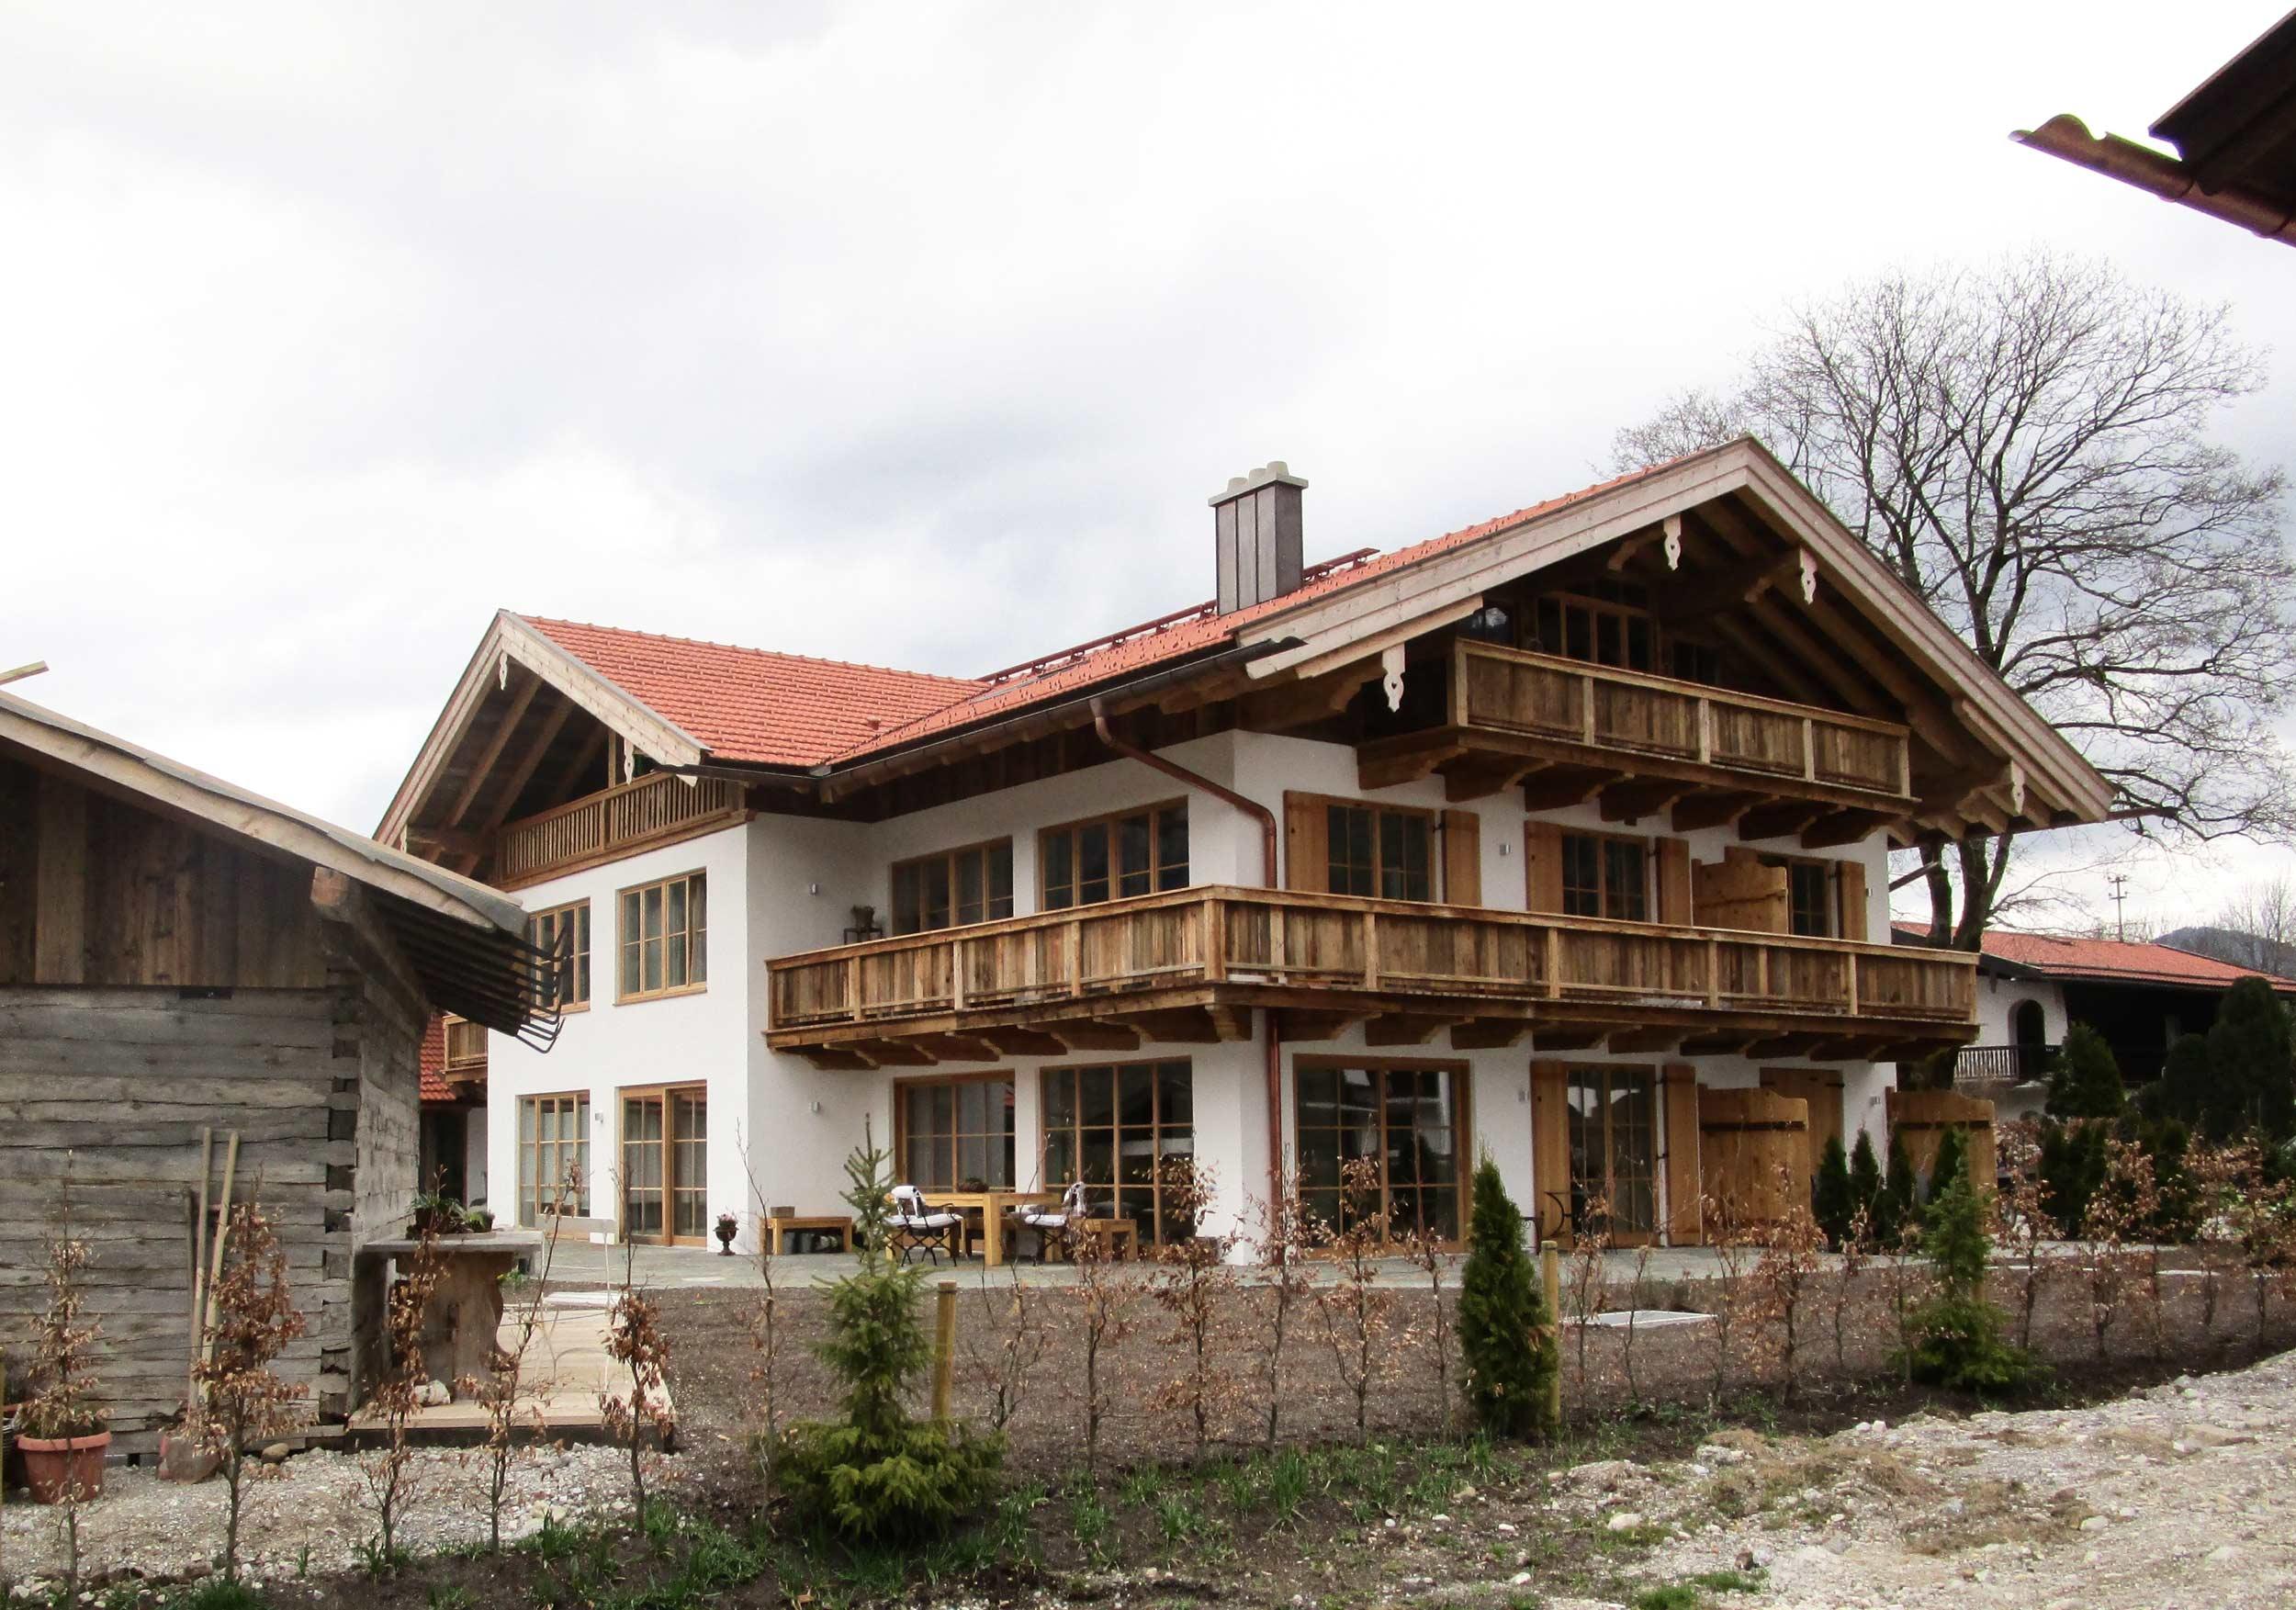 zimmerei-stoib-holzbau-holzhaus-altholz-fassade-blockschalung-merhfamilienhaus-balkon-02.jpg